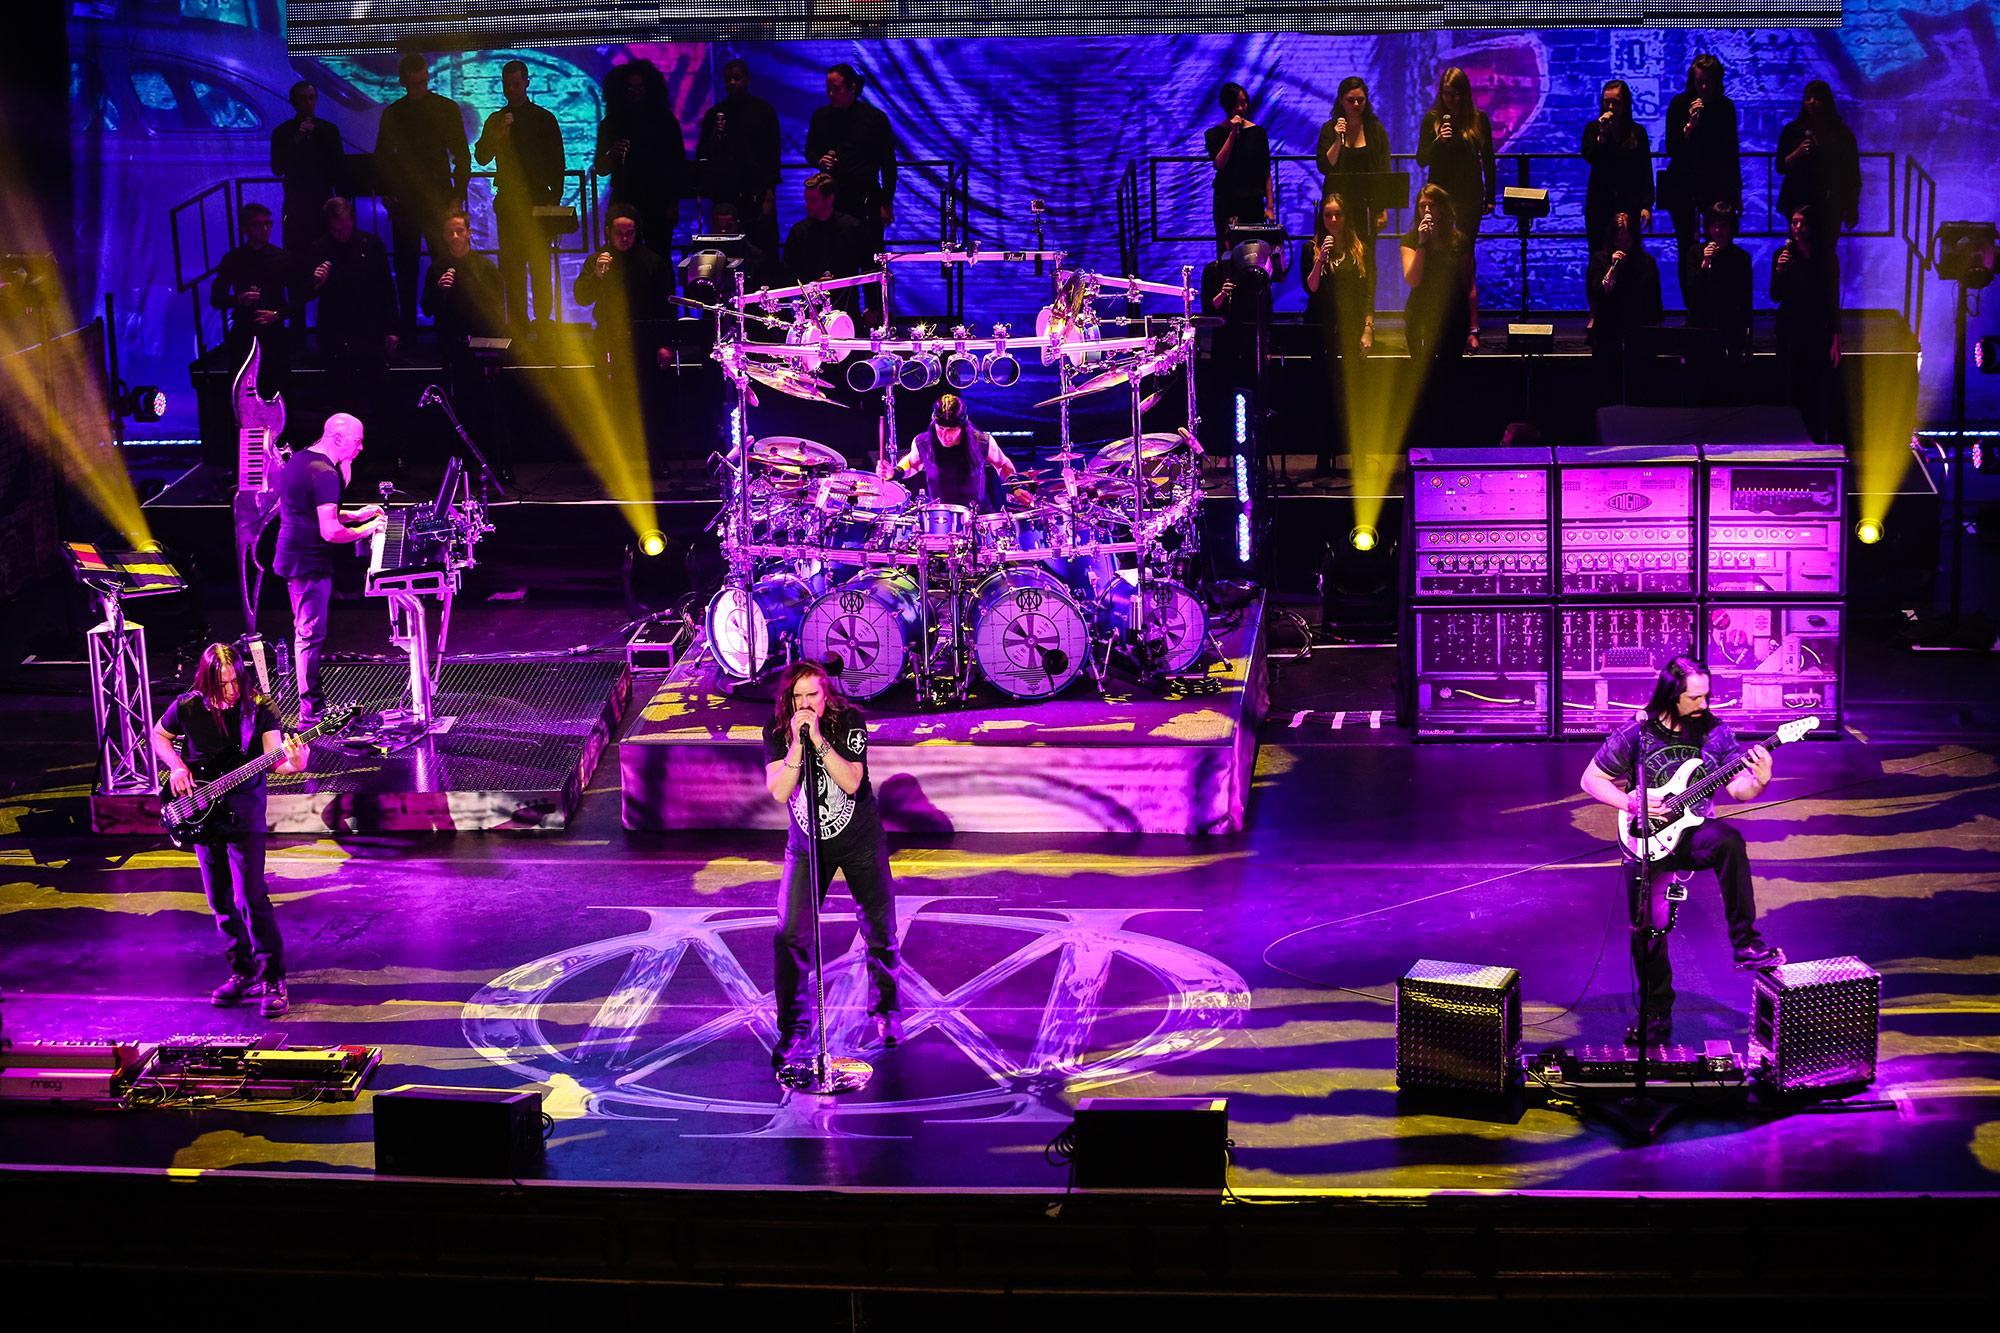 Dream_Theater_Pressebilder_2014_39912